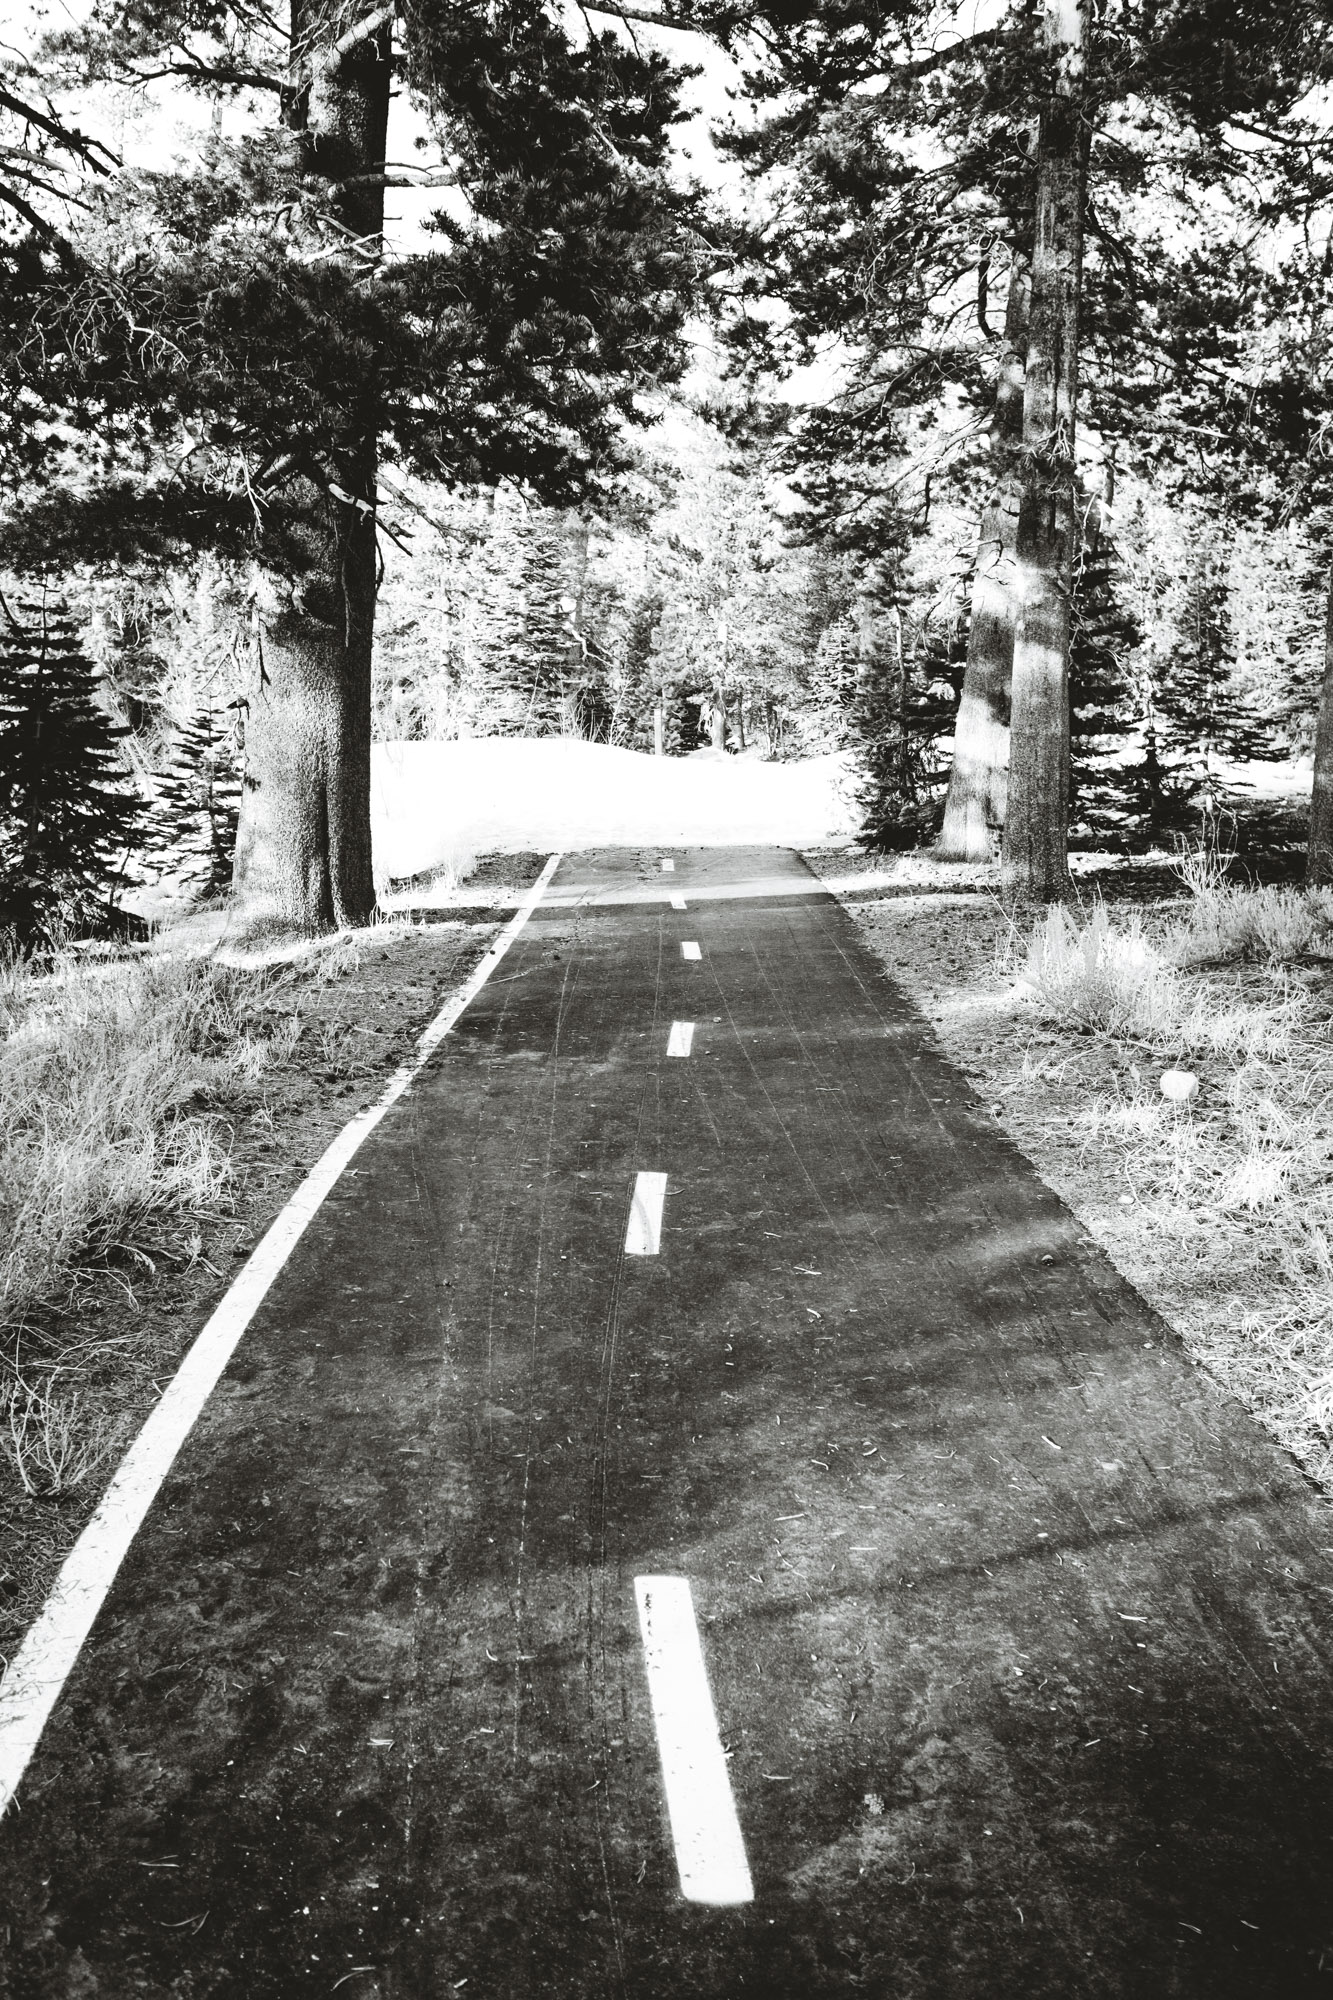 snow-road-twin-lakes-mammoth-lakes